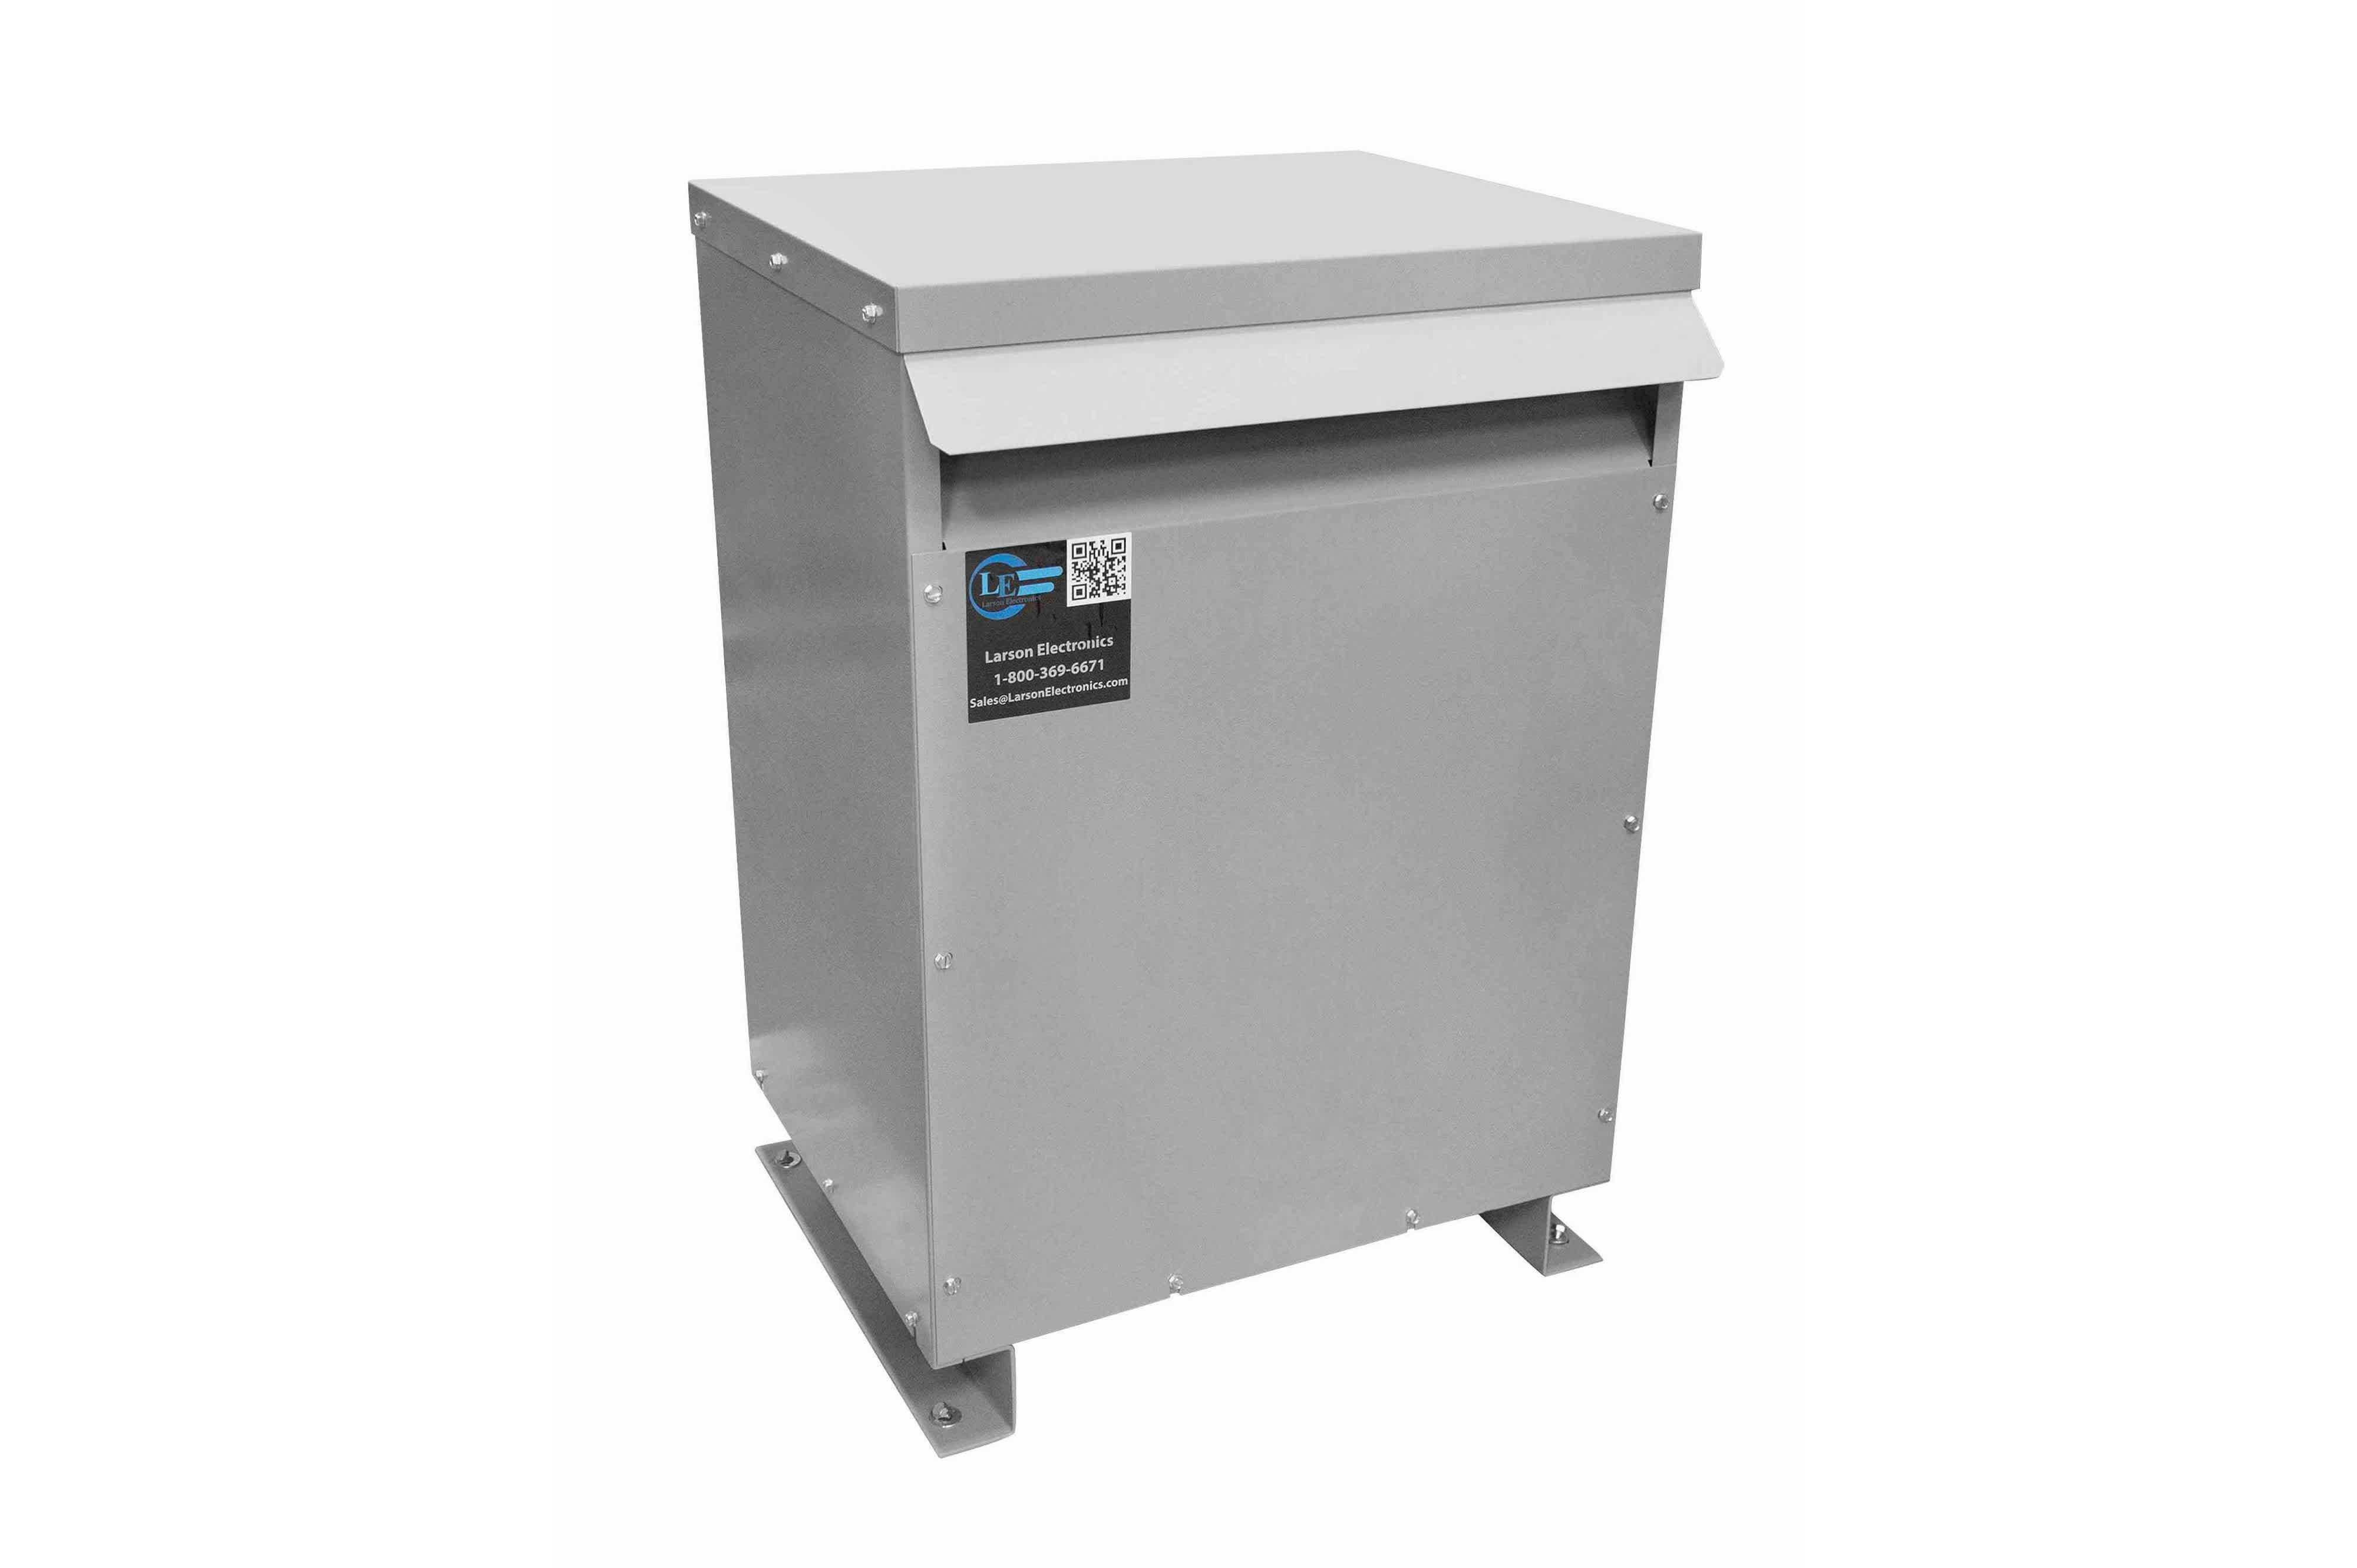 400 kVA 3PH Isolation Transformer, 600V Wye Primary, 240V Delta Secondary, N3R, Ventilated, 60 Hz